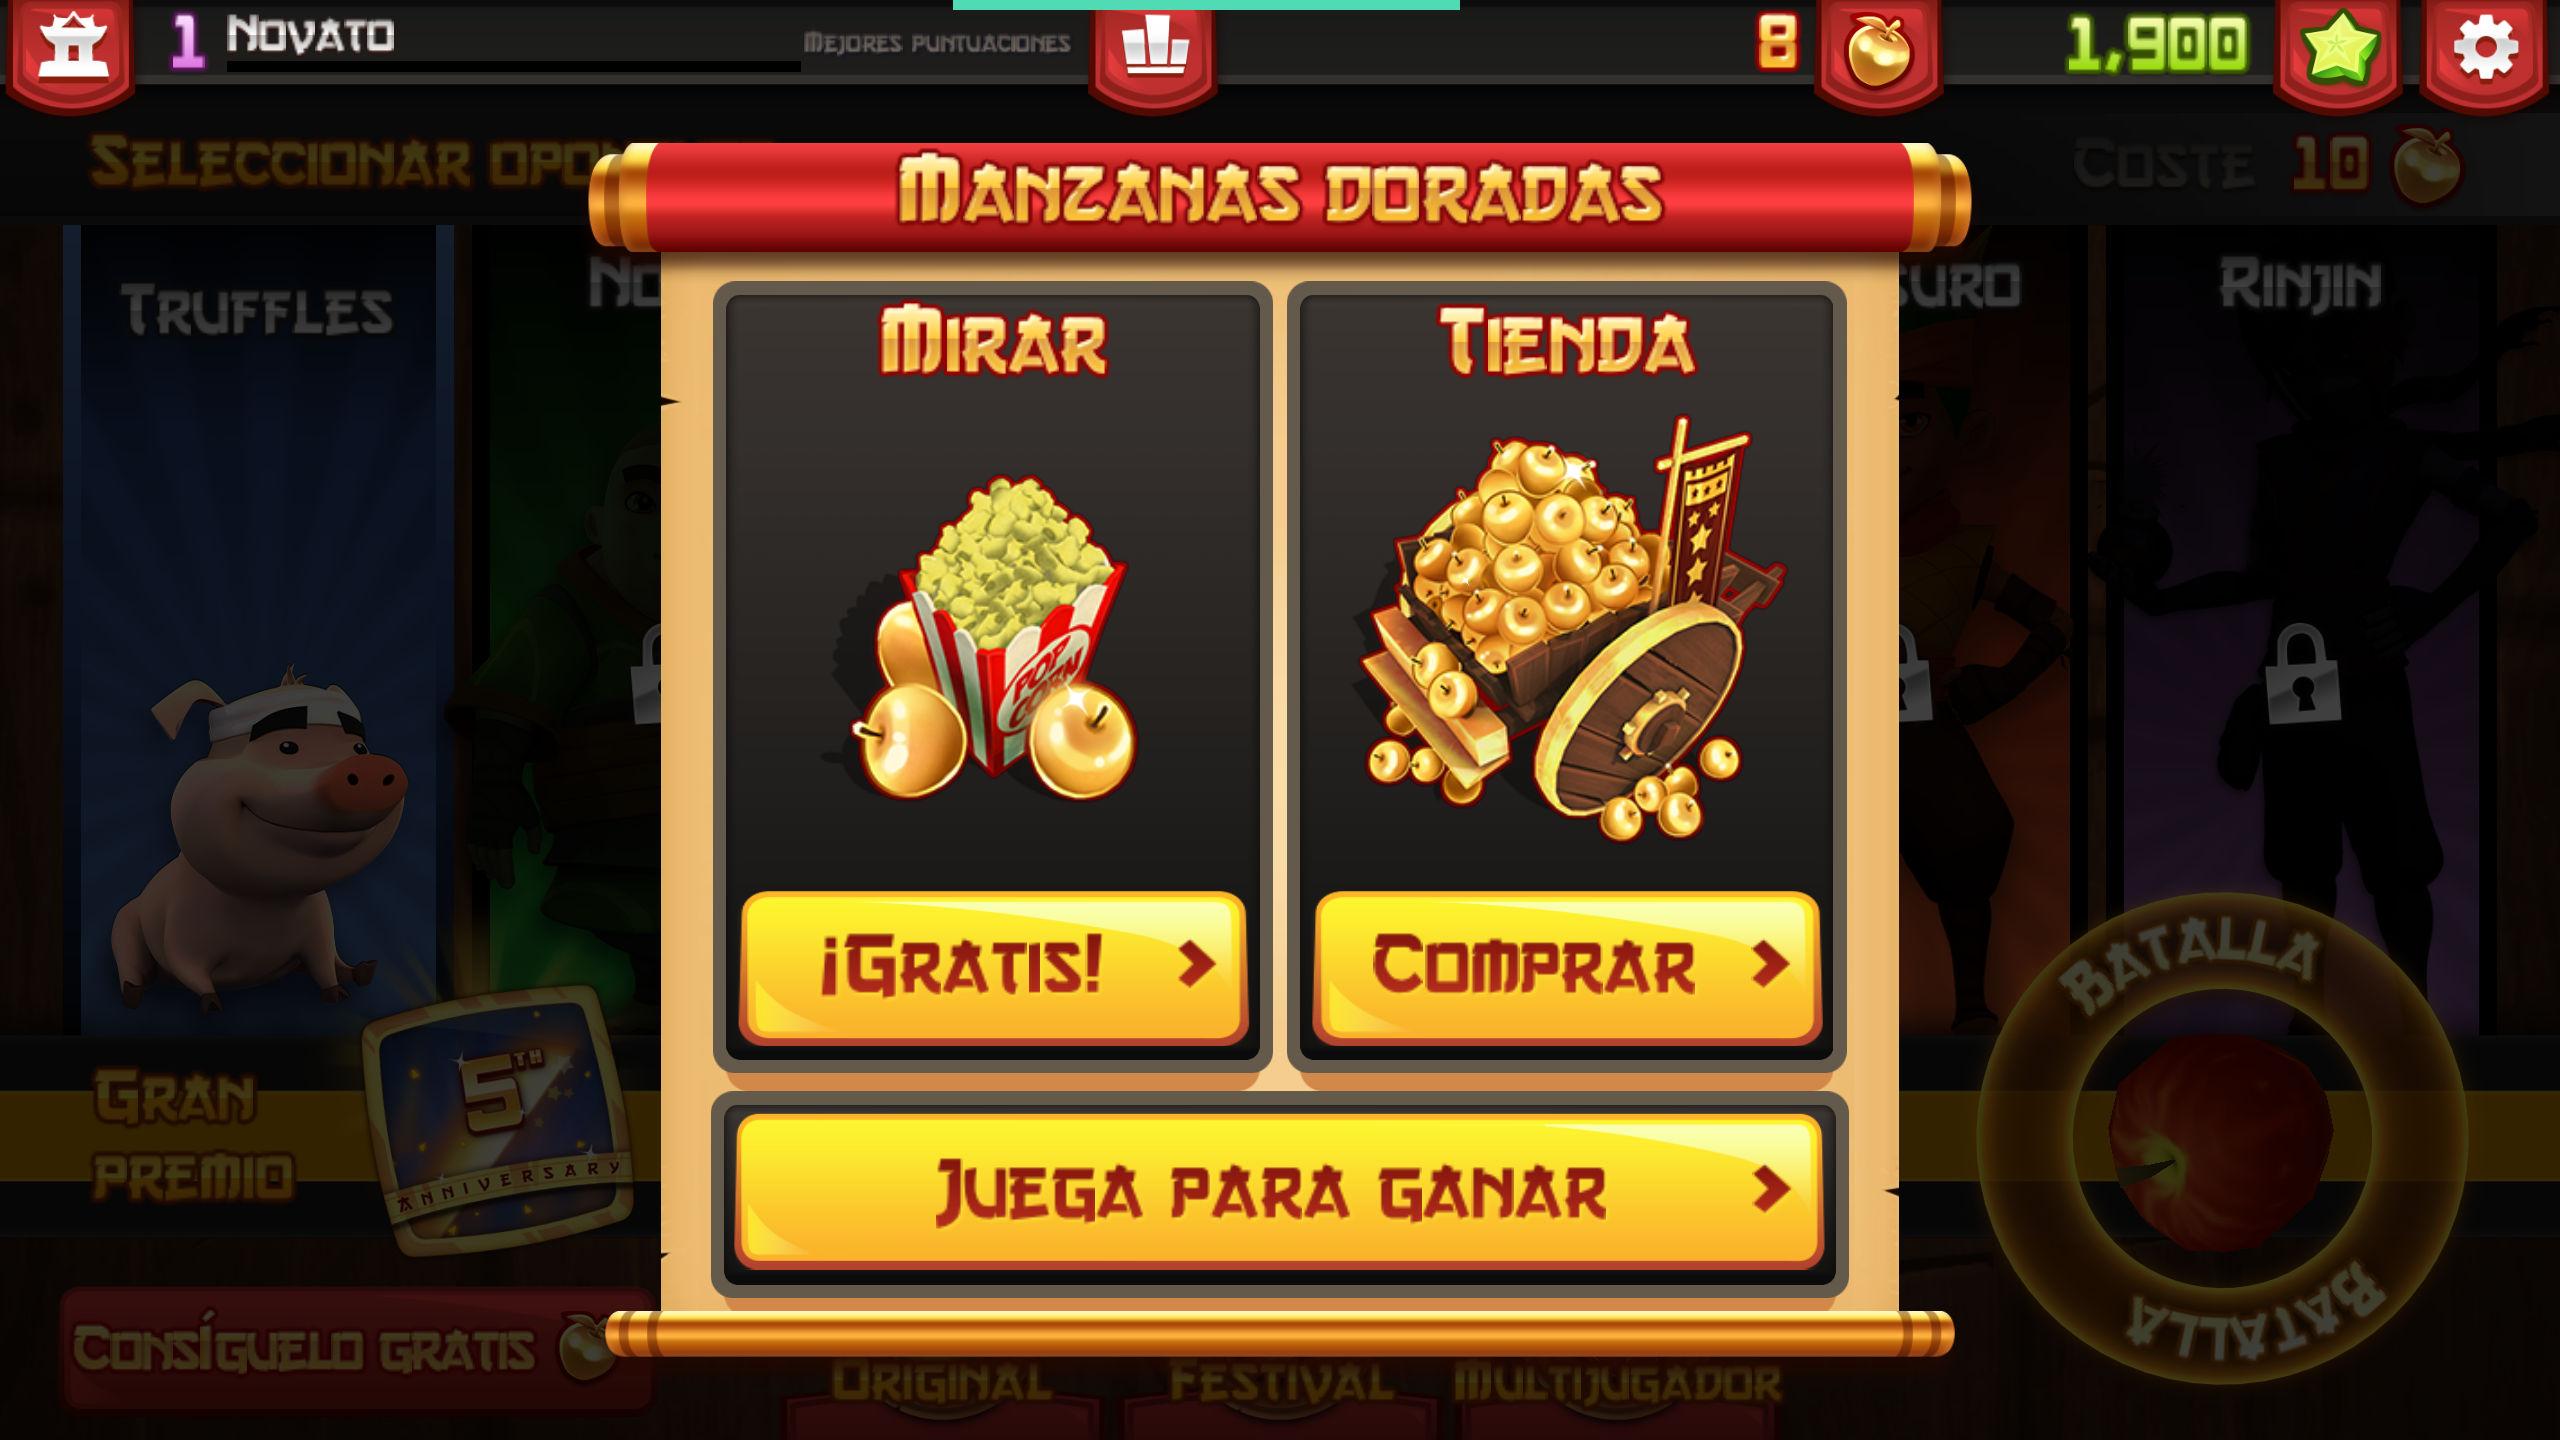 Conseguir manzanas doradas en Fruit Ninja gratis